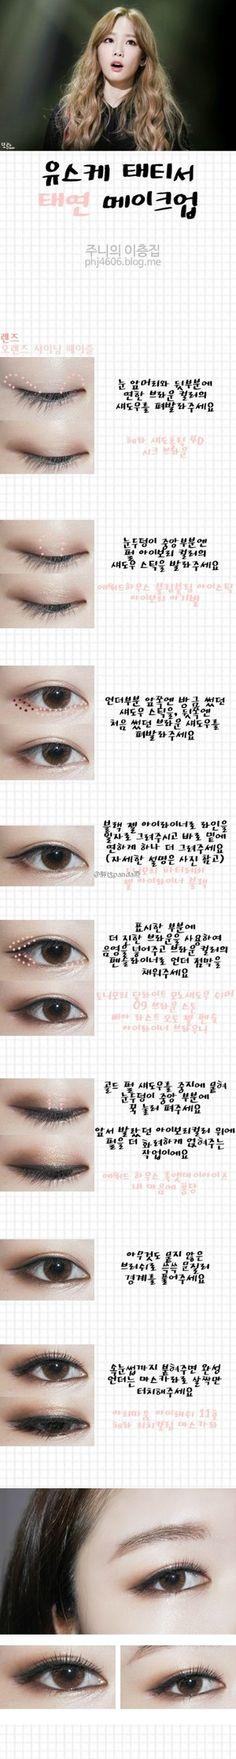 Kpop makeup ⭐️⭐ #JoinNerium #DebbieKrug #NeriumKorea ️ www.SkincareInKorea.info